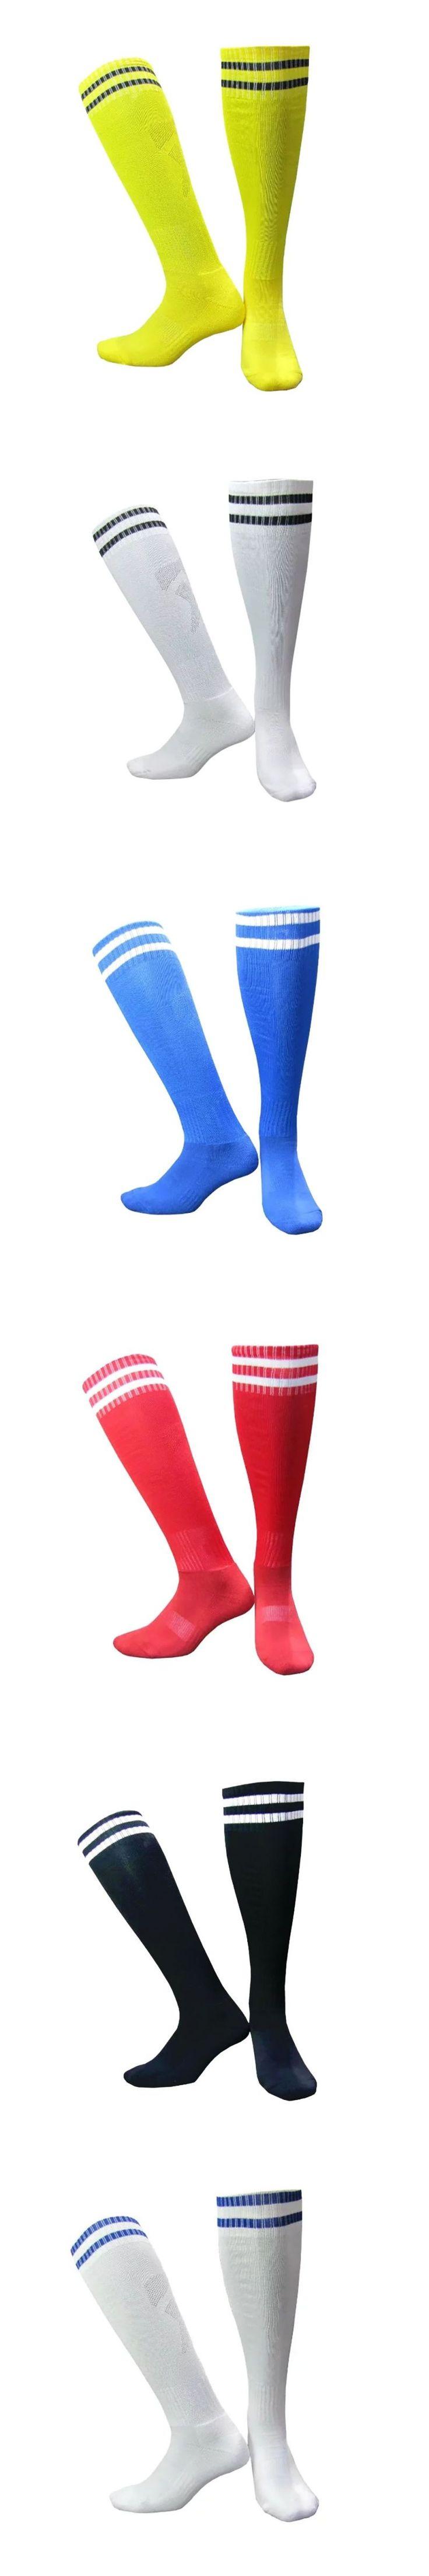 Man Compression Socks Tube Knee Striped Socks Over Knee High Sock Soft Leg Support Stretch Breathable Sock For Gift